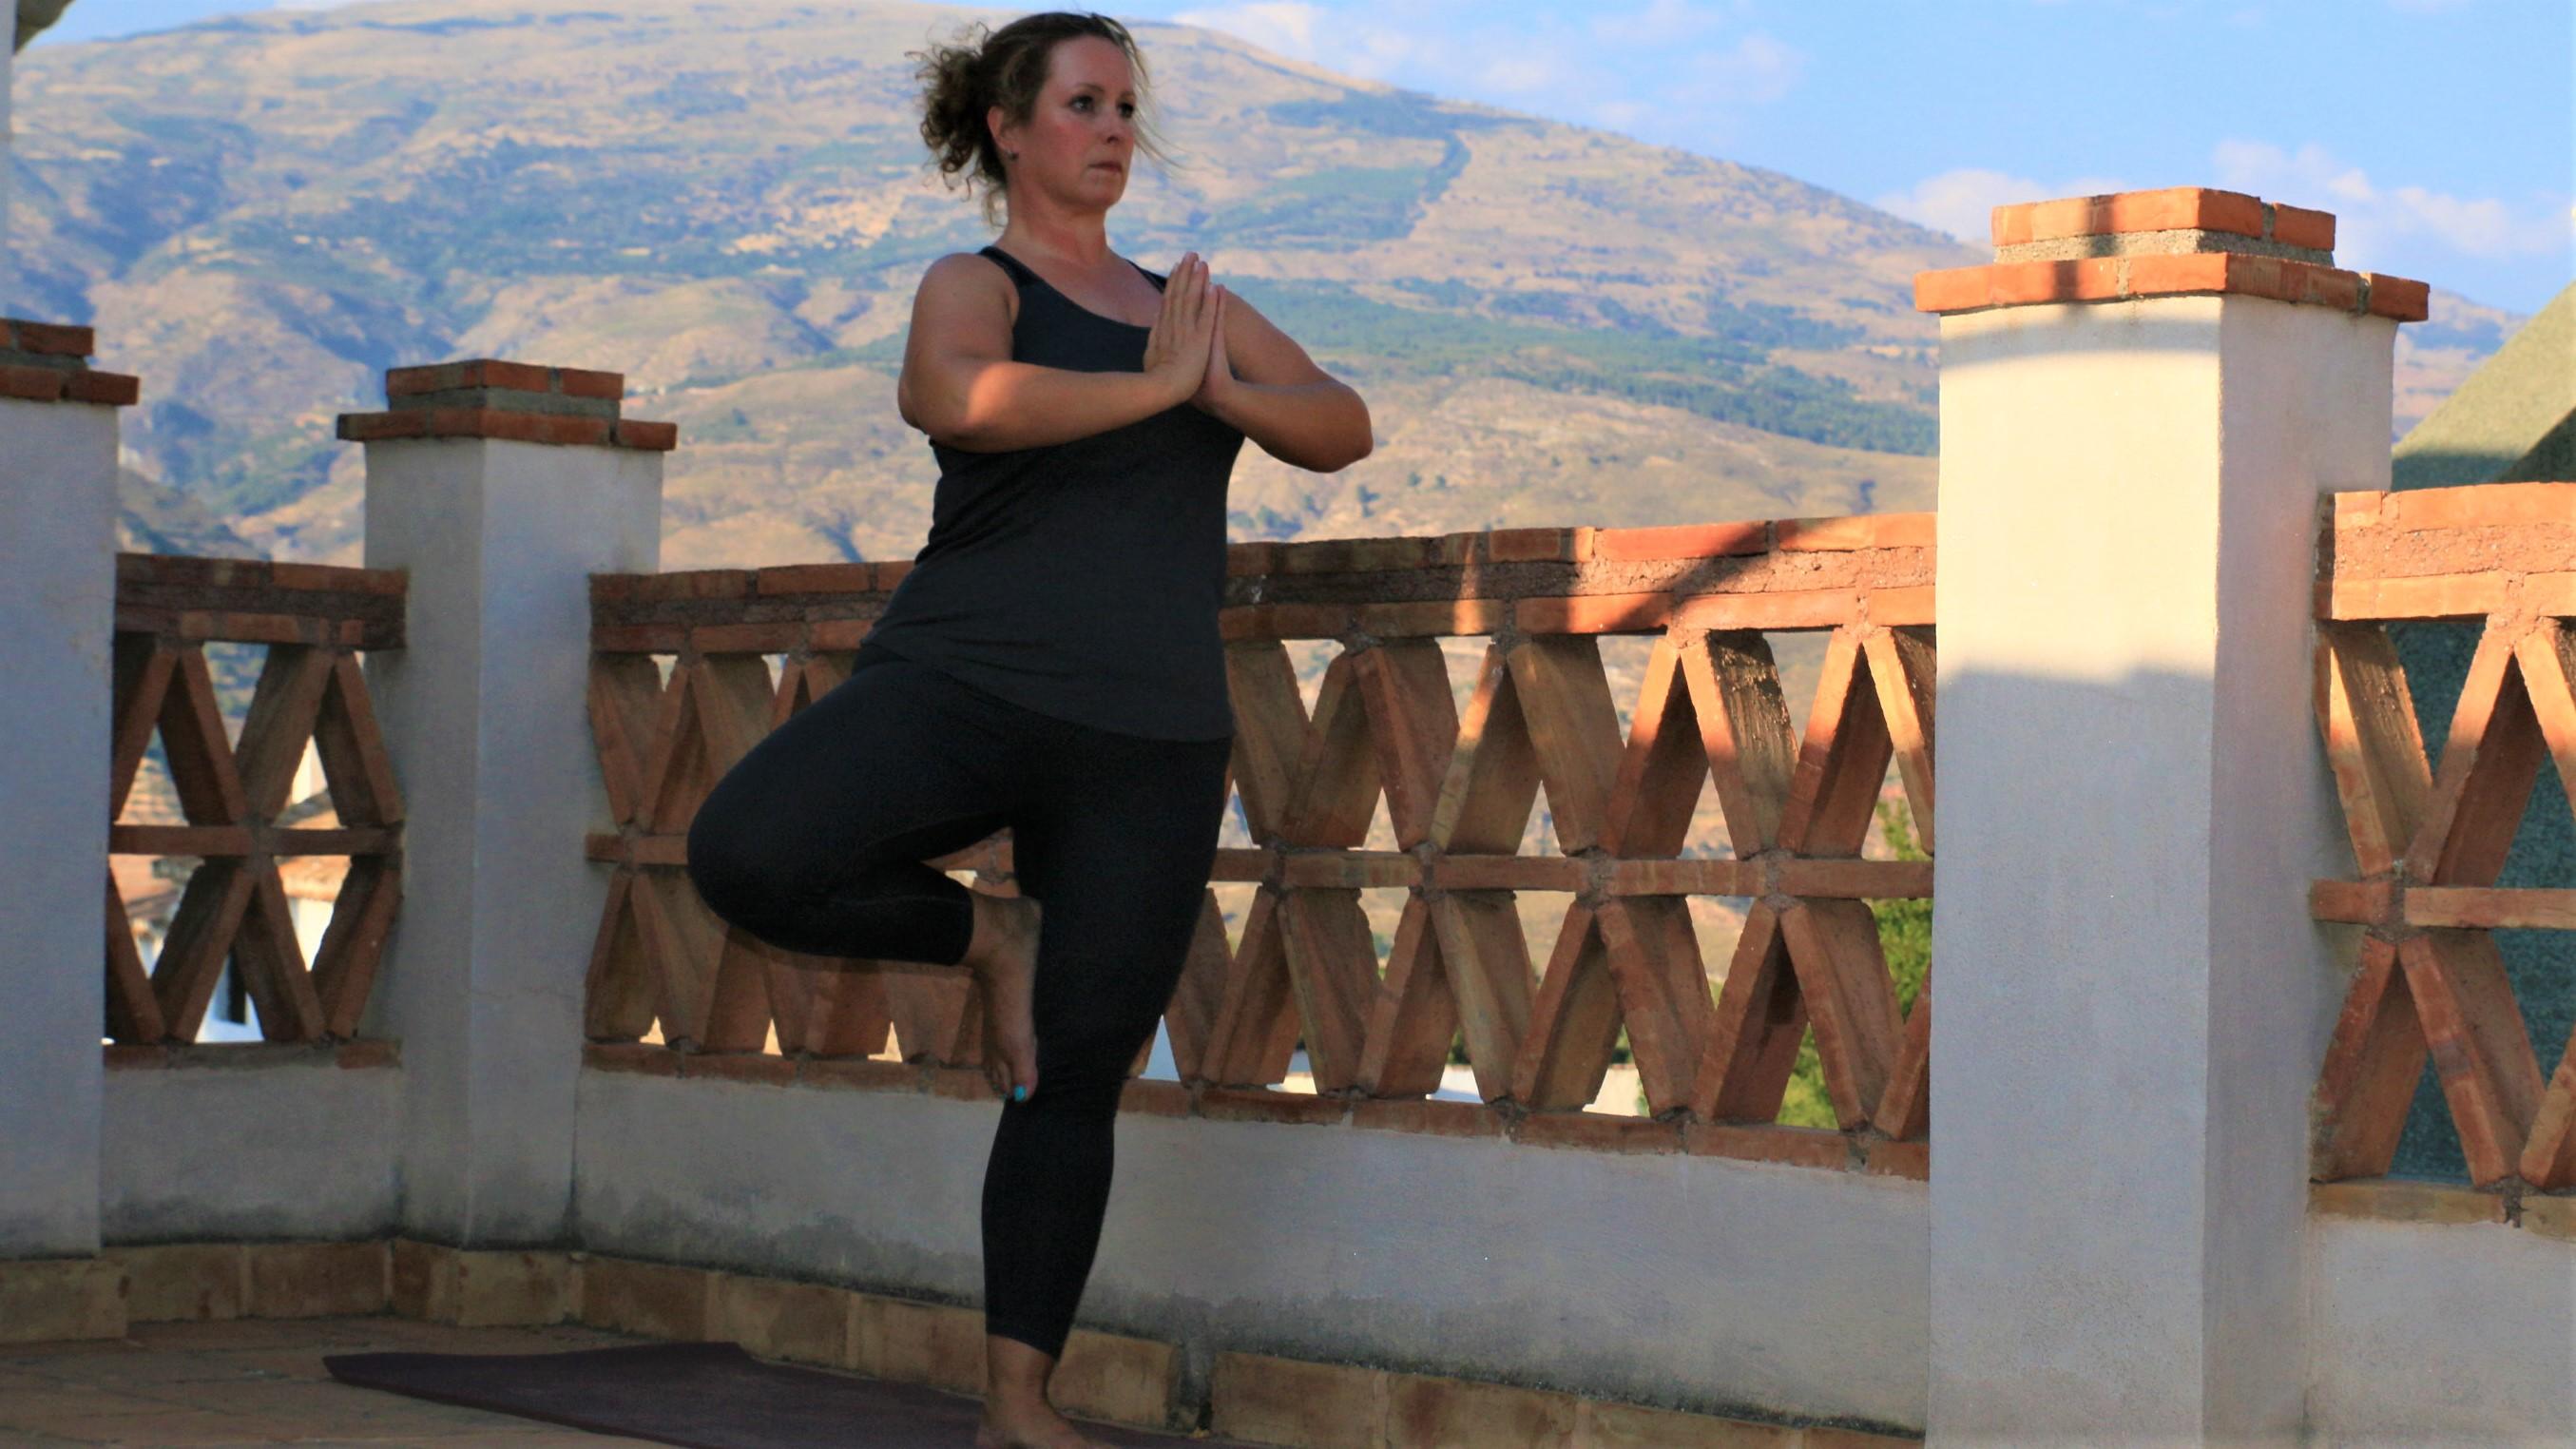 Yoga on roofterrace Casa del Patio